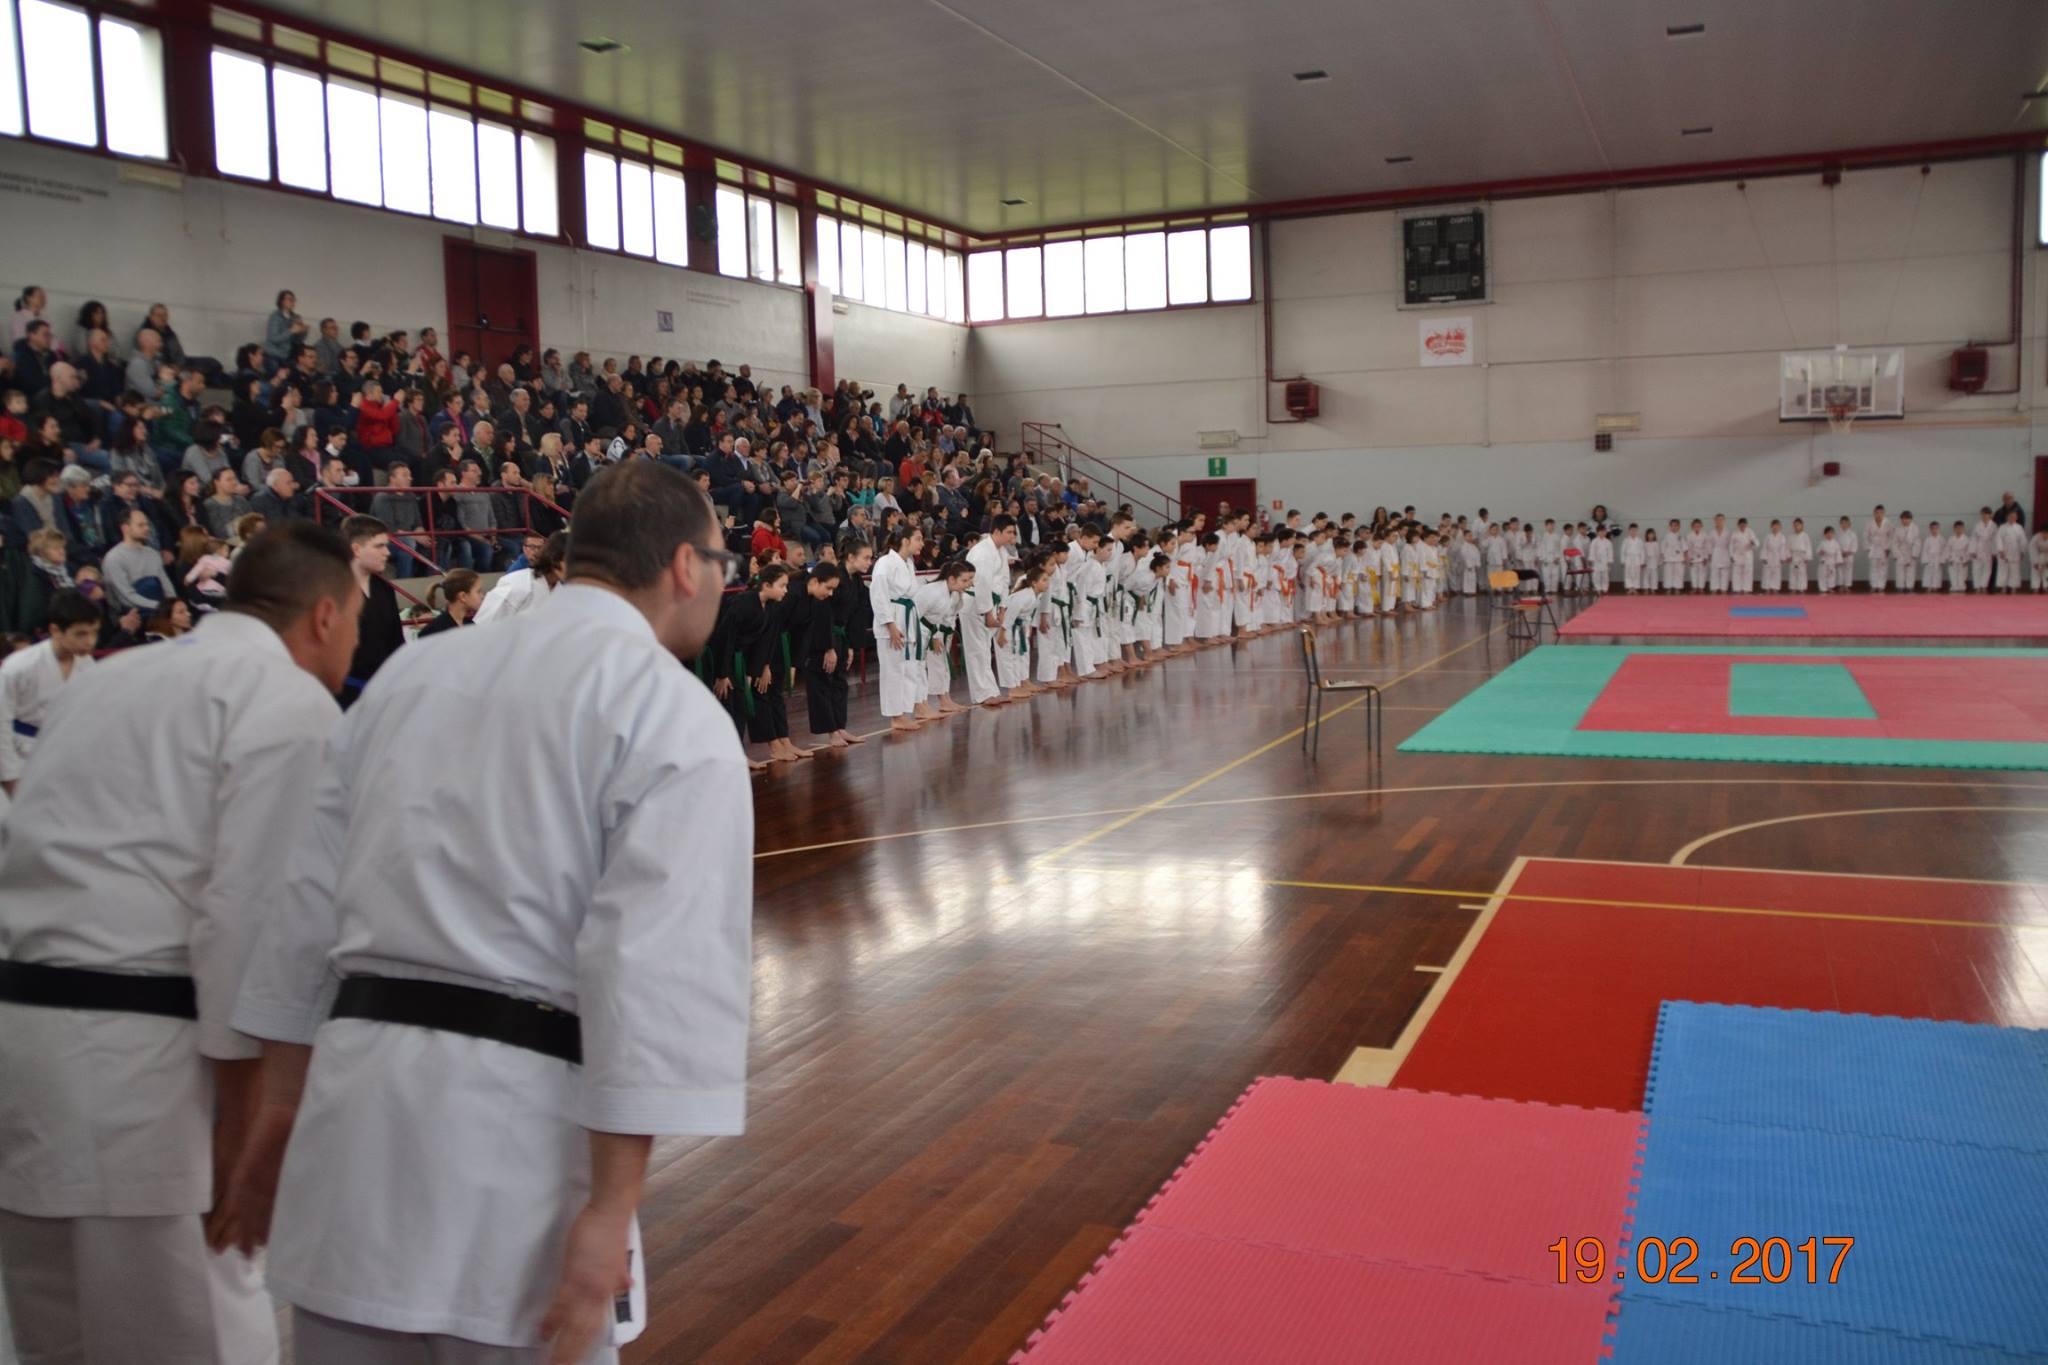 Venti  di karate a Dolo  un grande traguardo